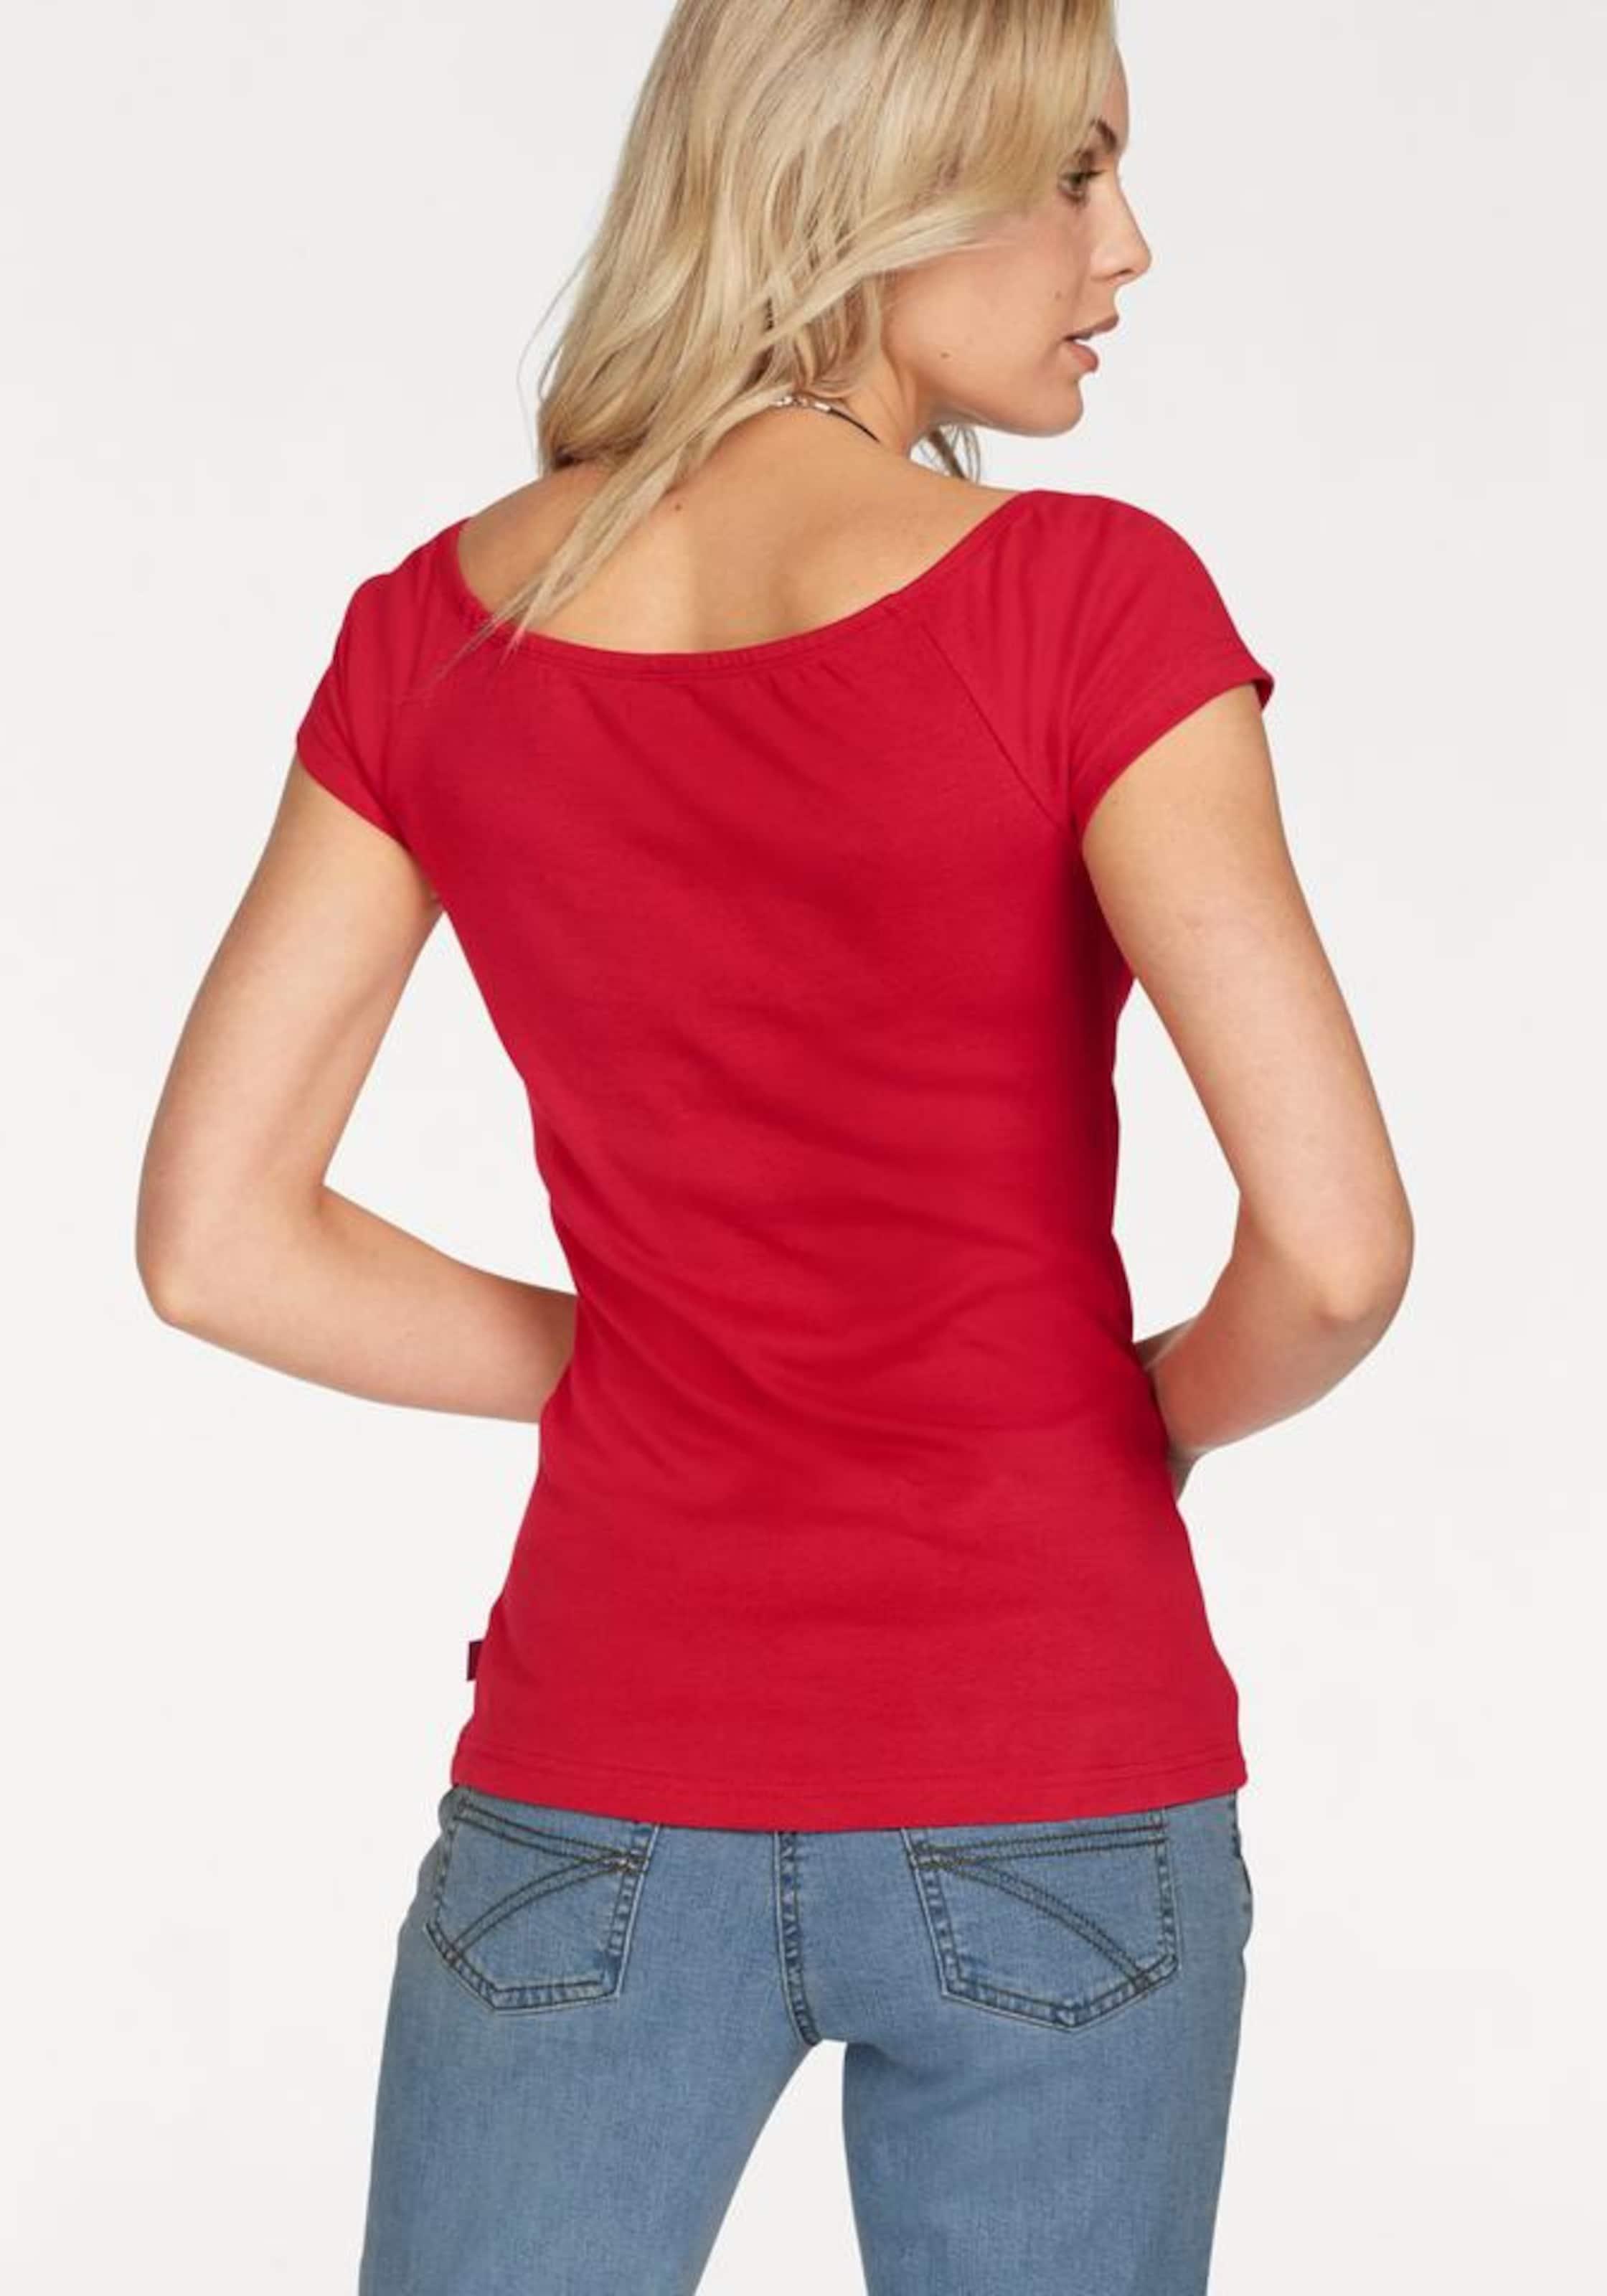 Sast Günstiger Preis Verkauf Versorgung ARIZONA Carmenshirt Off-Shoulder Rrm0DYpbfQ